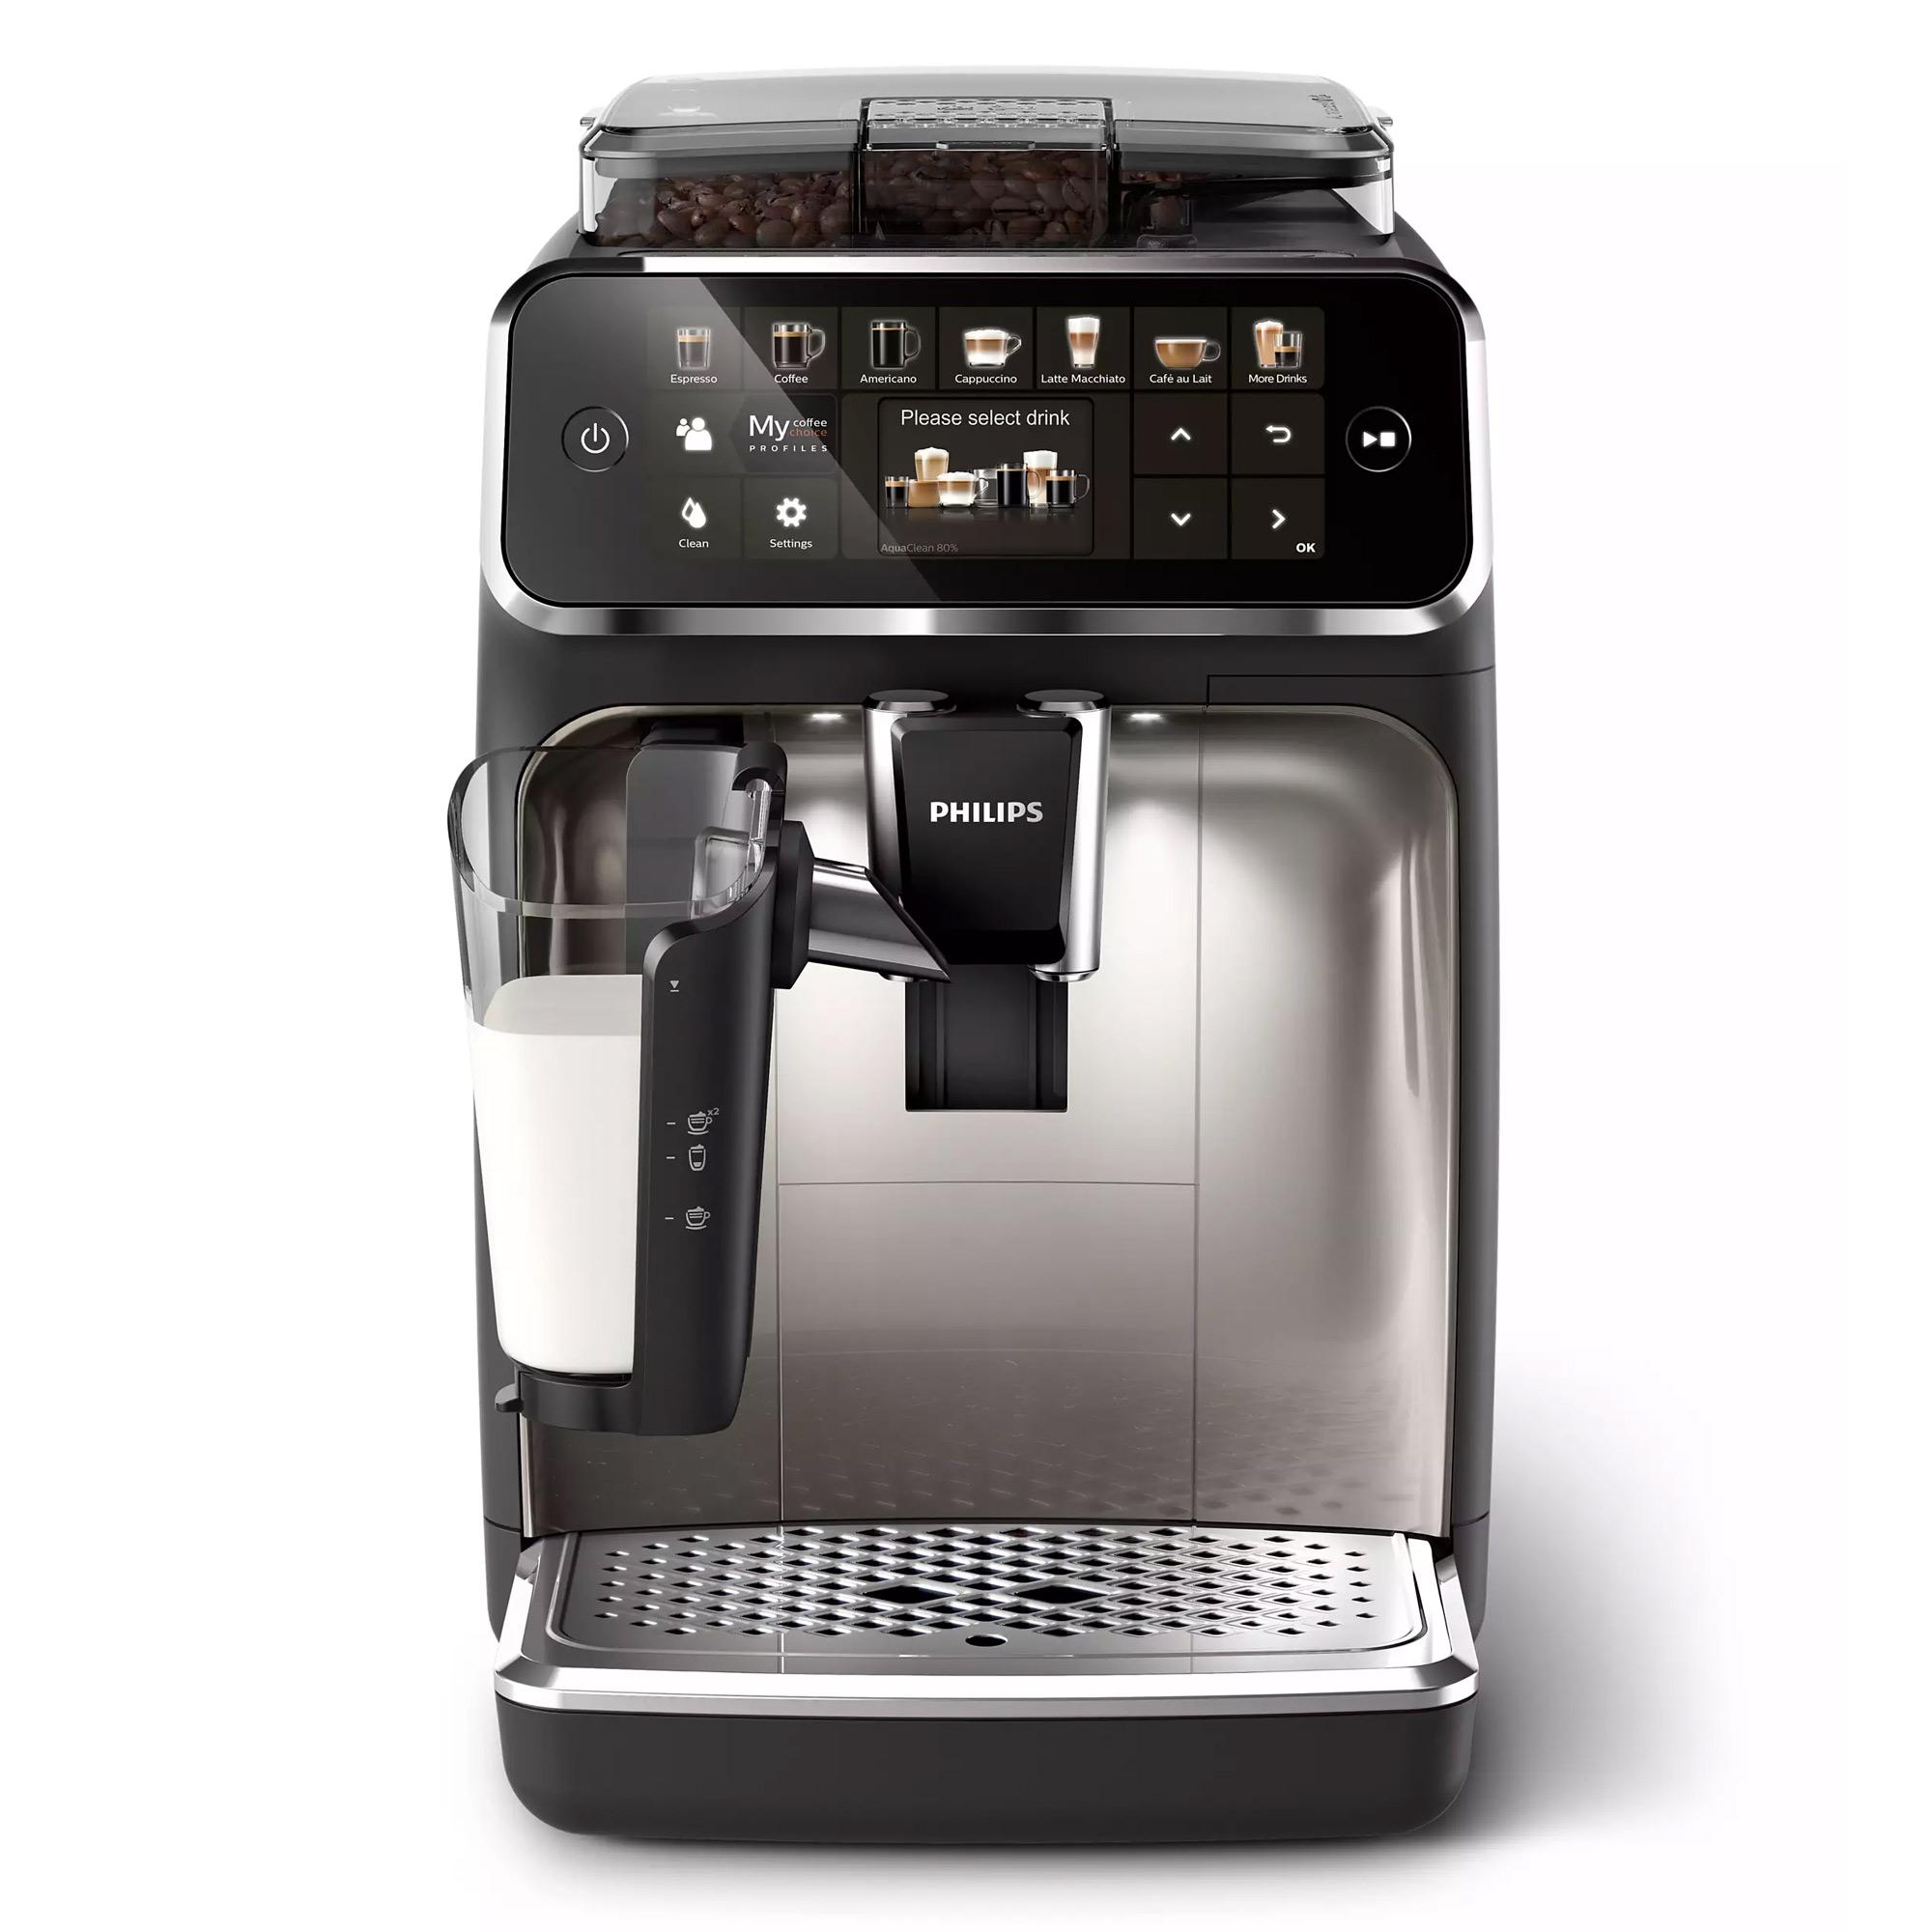 Philips / Saeco --5400 LatteGo Superautomatic Espresso Machine - EP5447/94